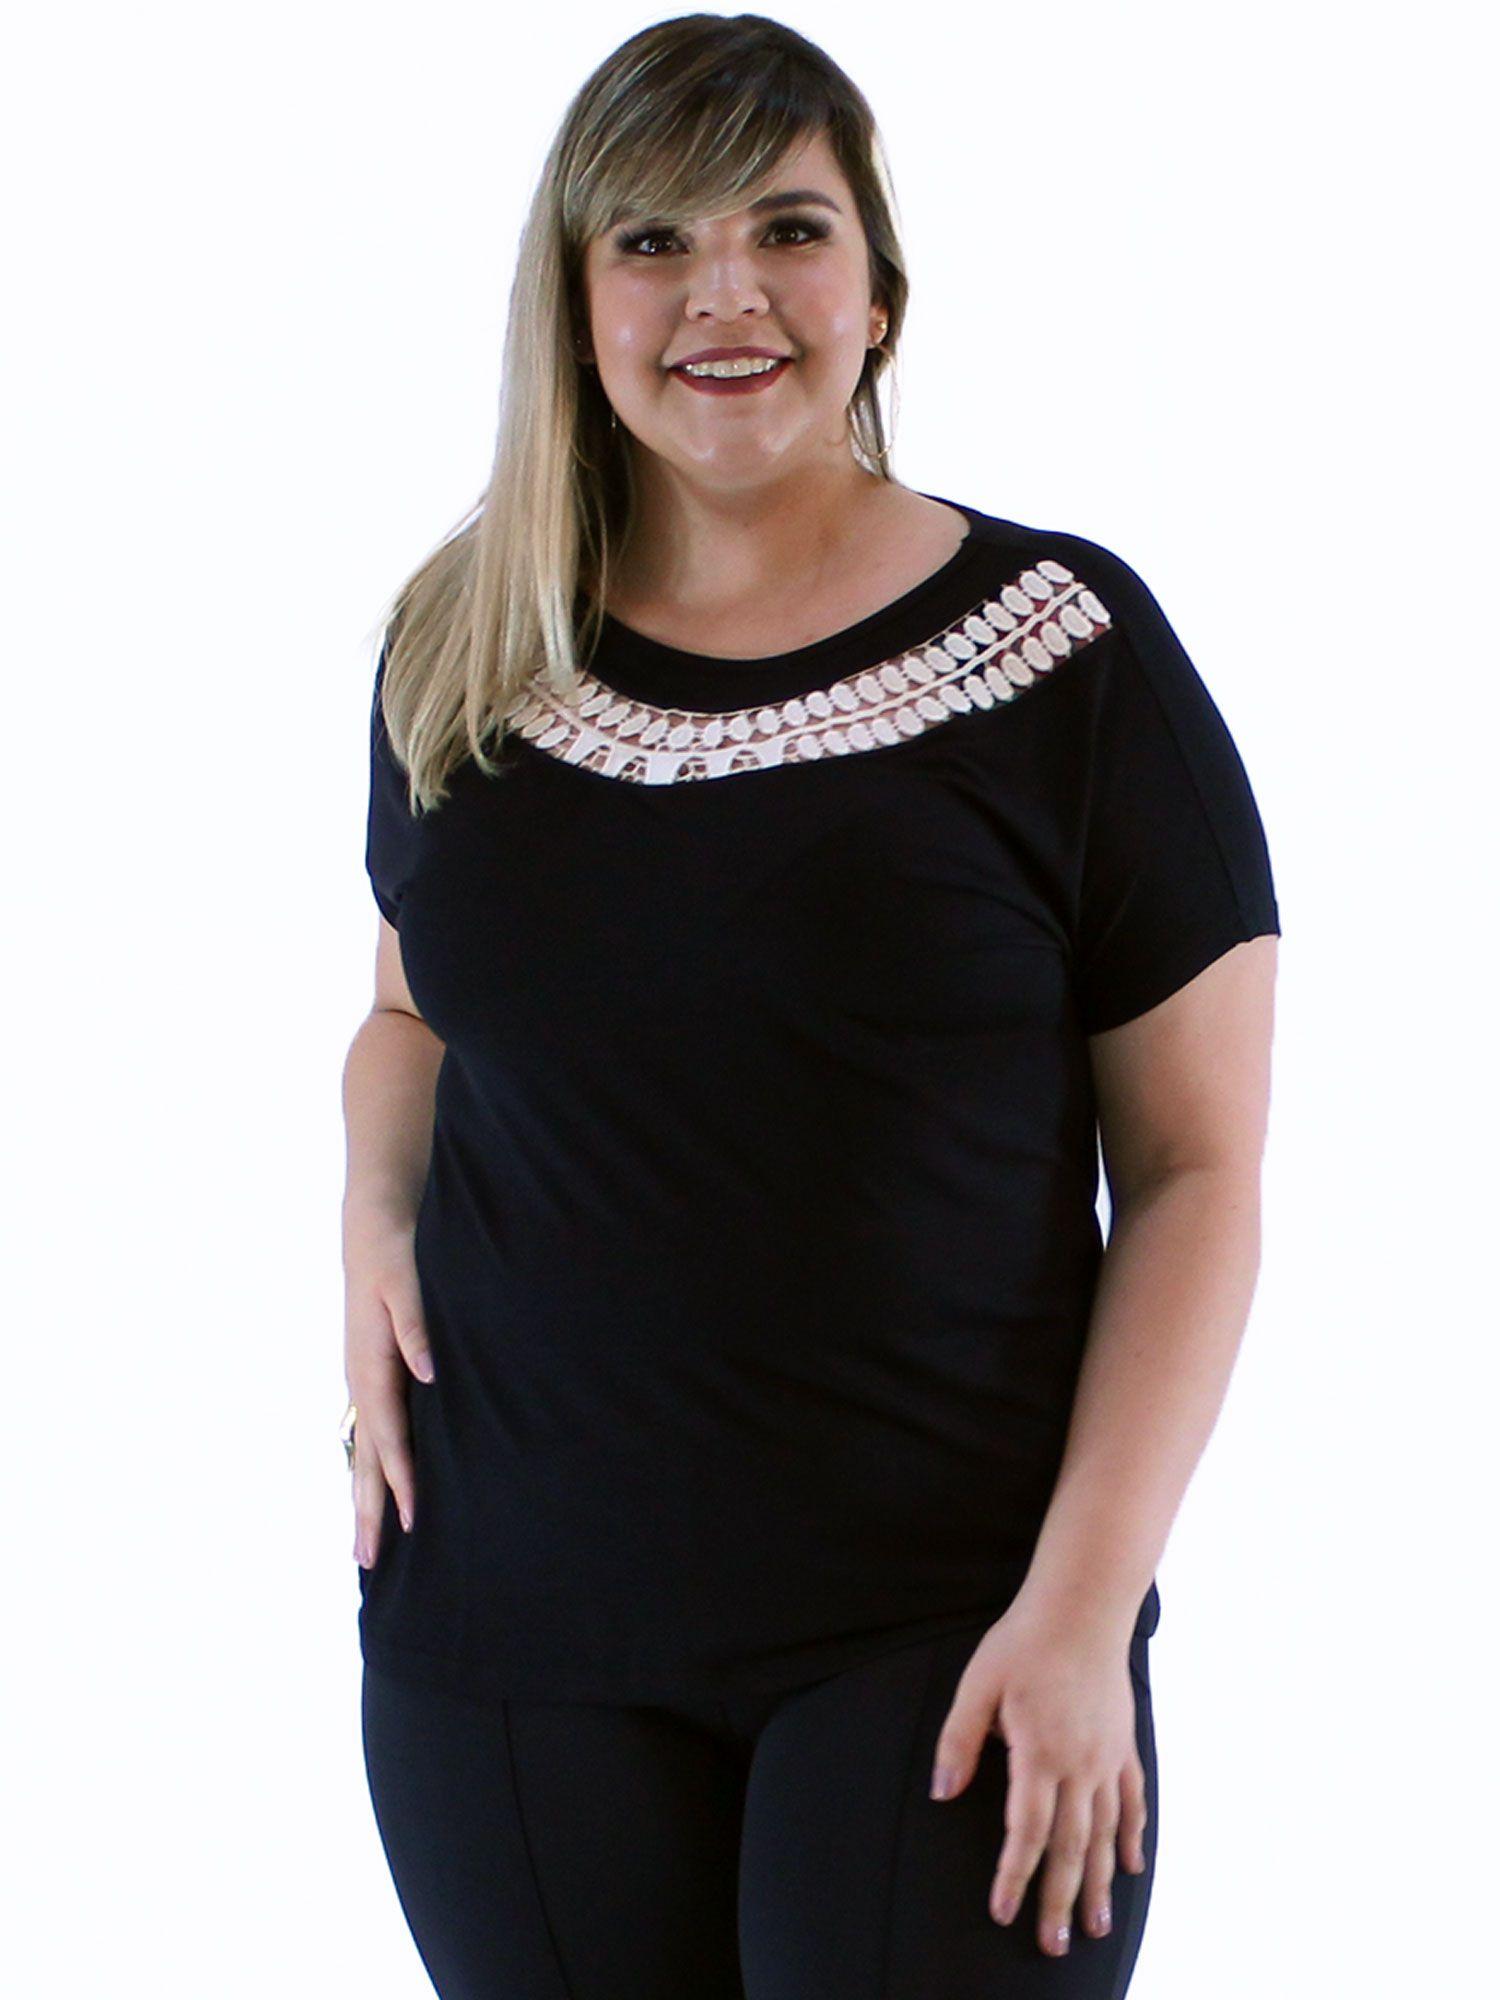 Blusa Plus Size Decote com Renda de Guipir KTS Preto